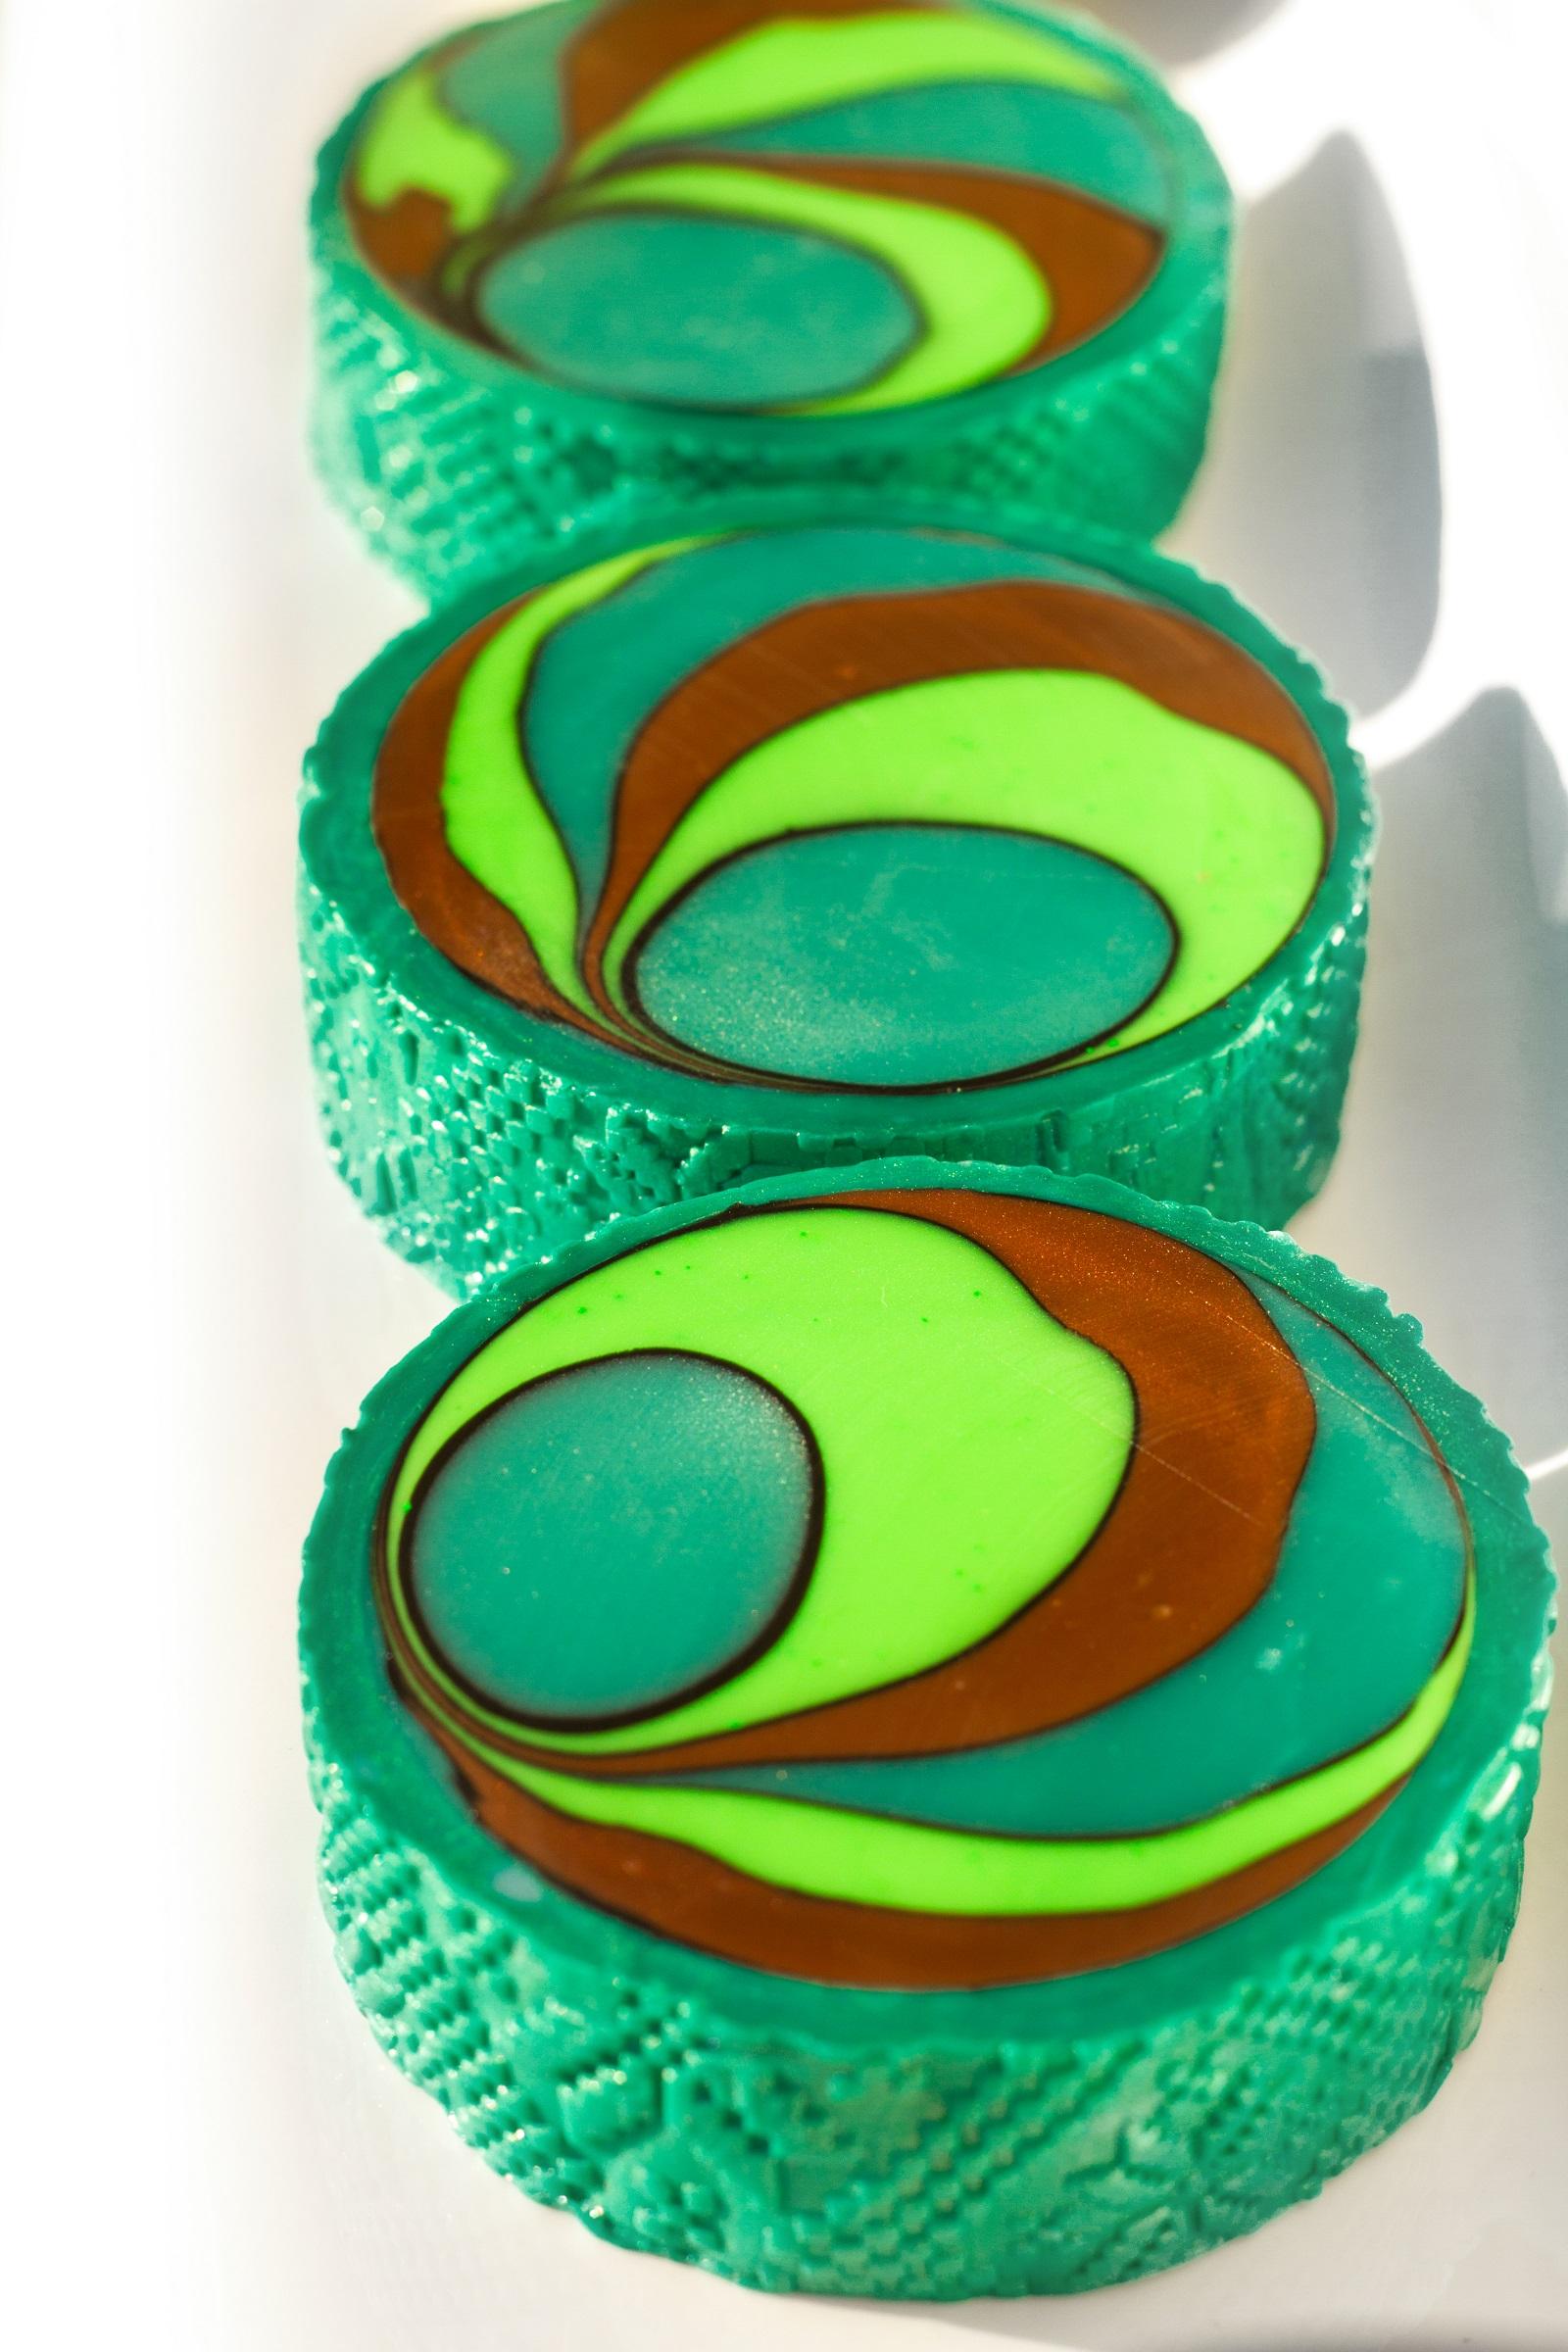 grinchs lollipop